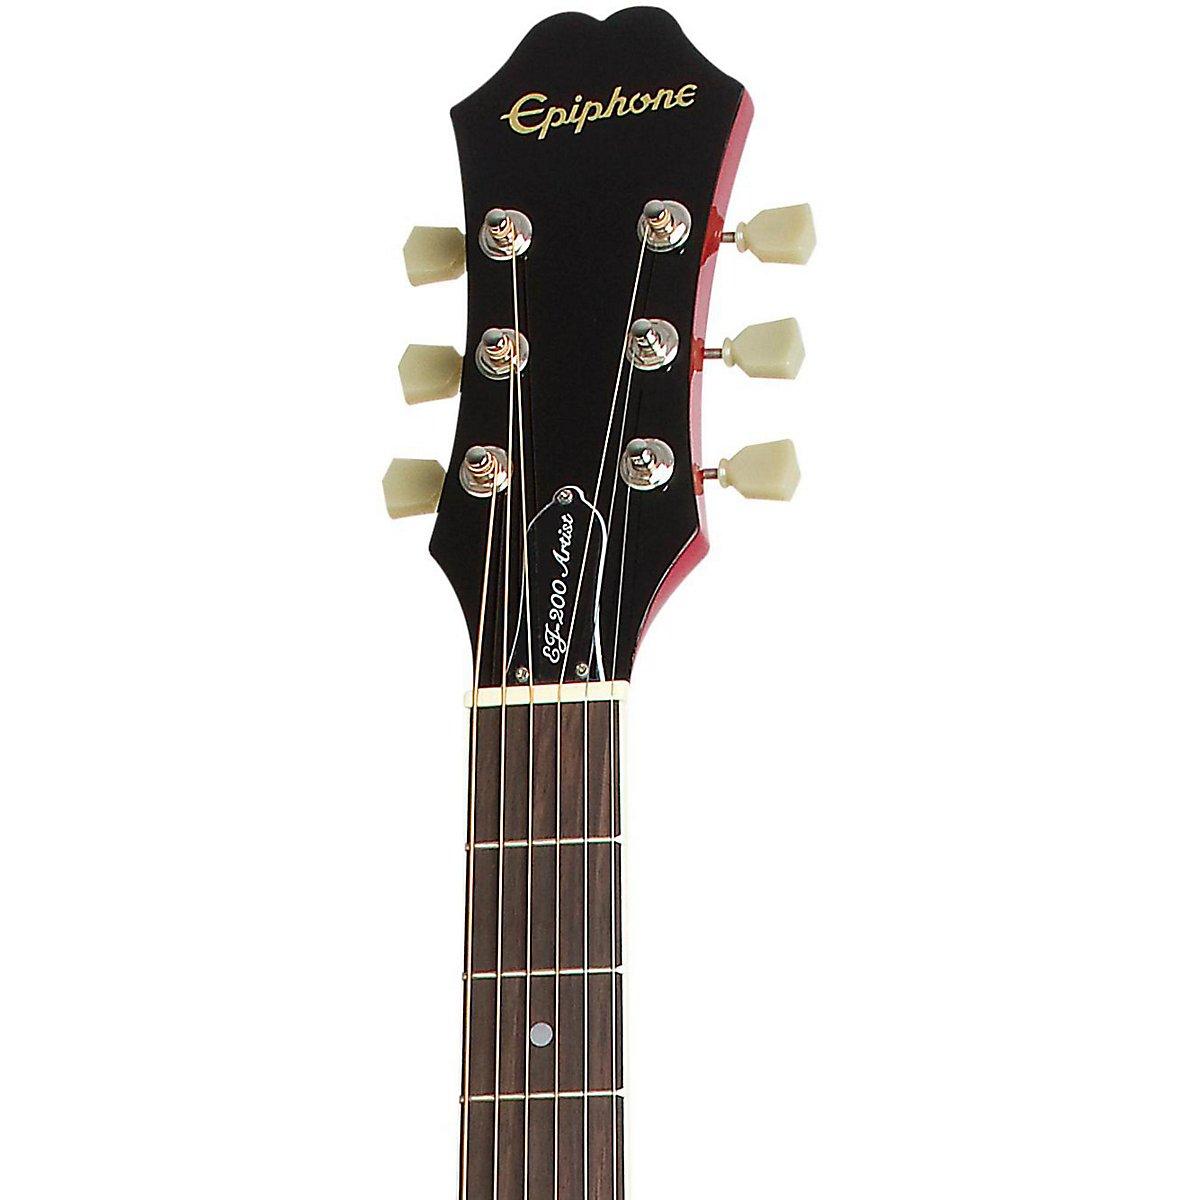 eaeawrnh3 Epiphone EJ-200 Artist guitarra acústica: Amazon.es ...